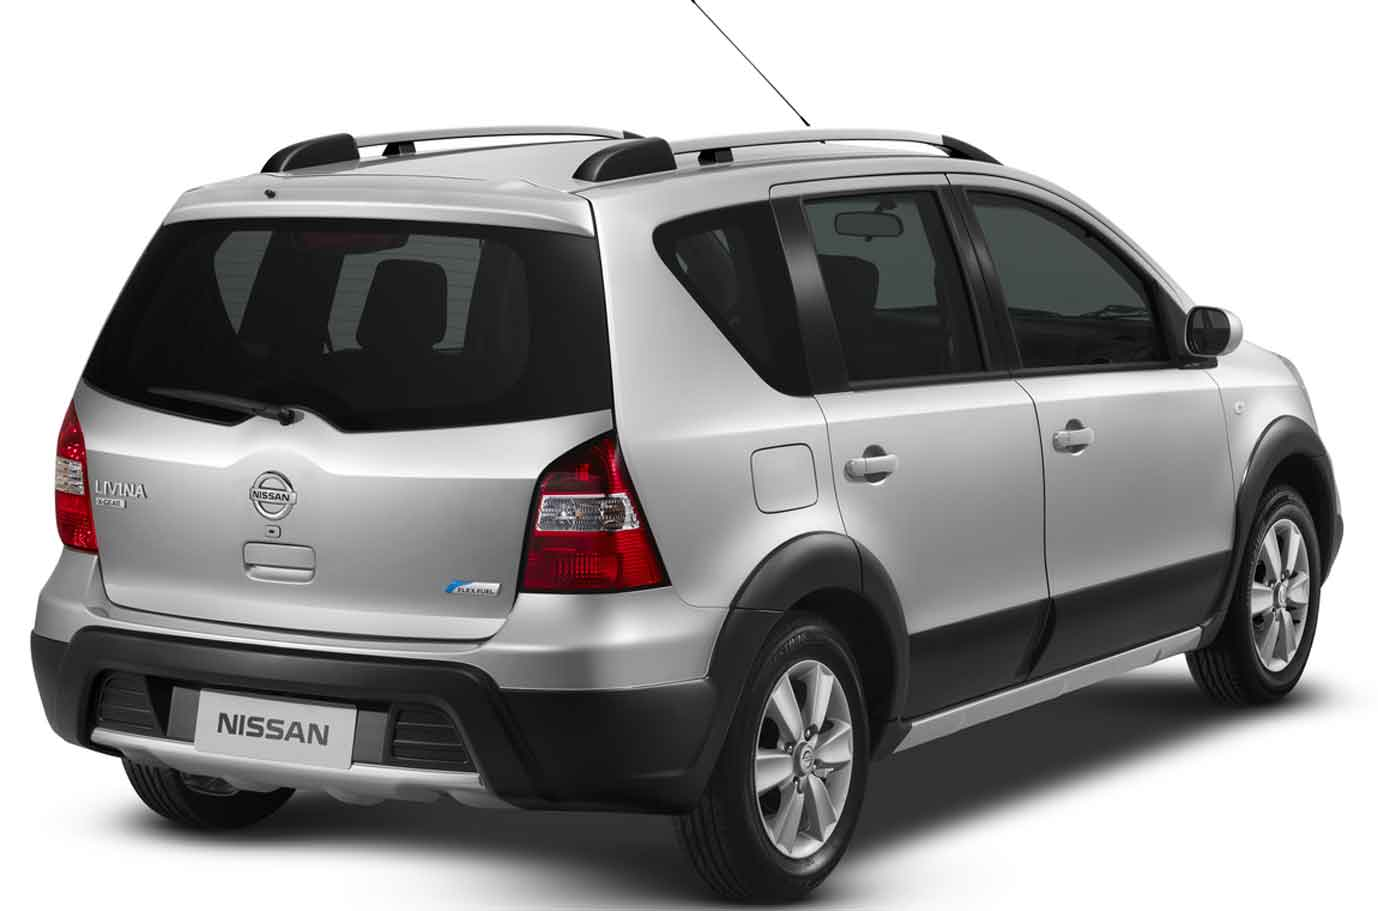 novo Nissan Livina 2014 traseira